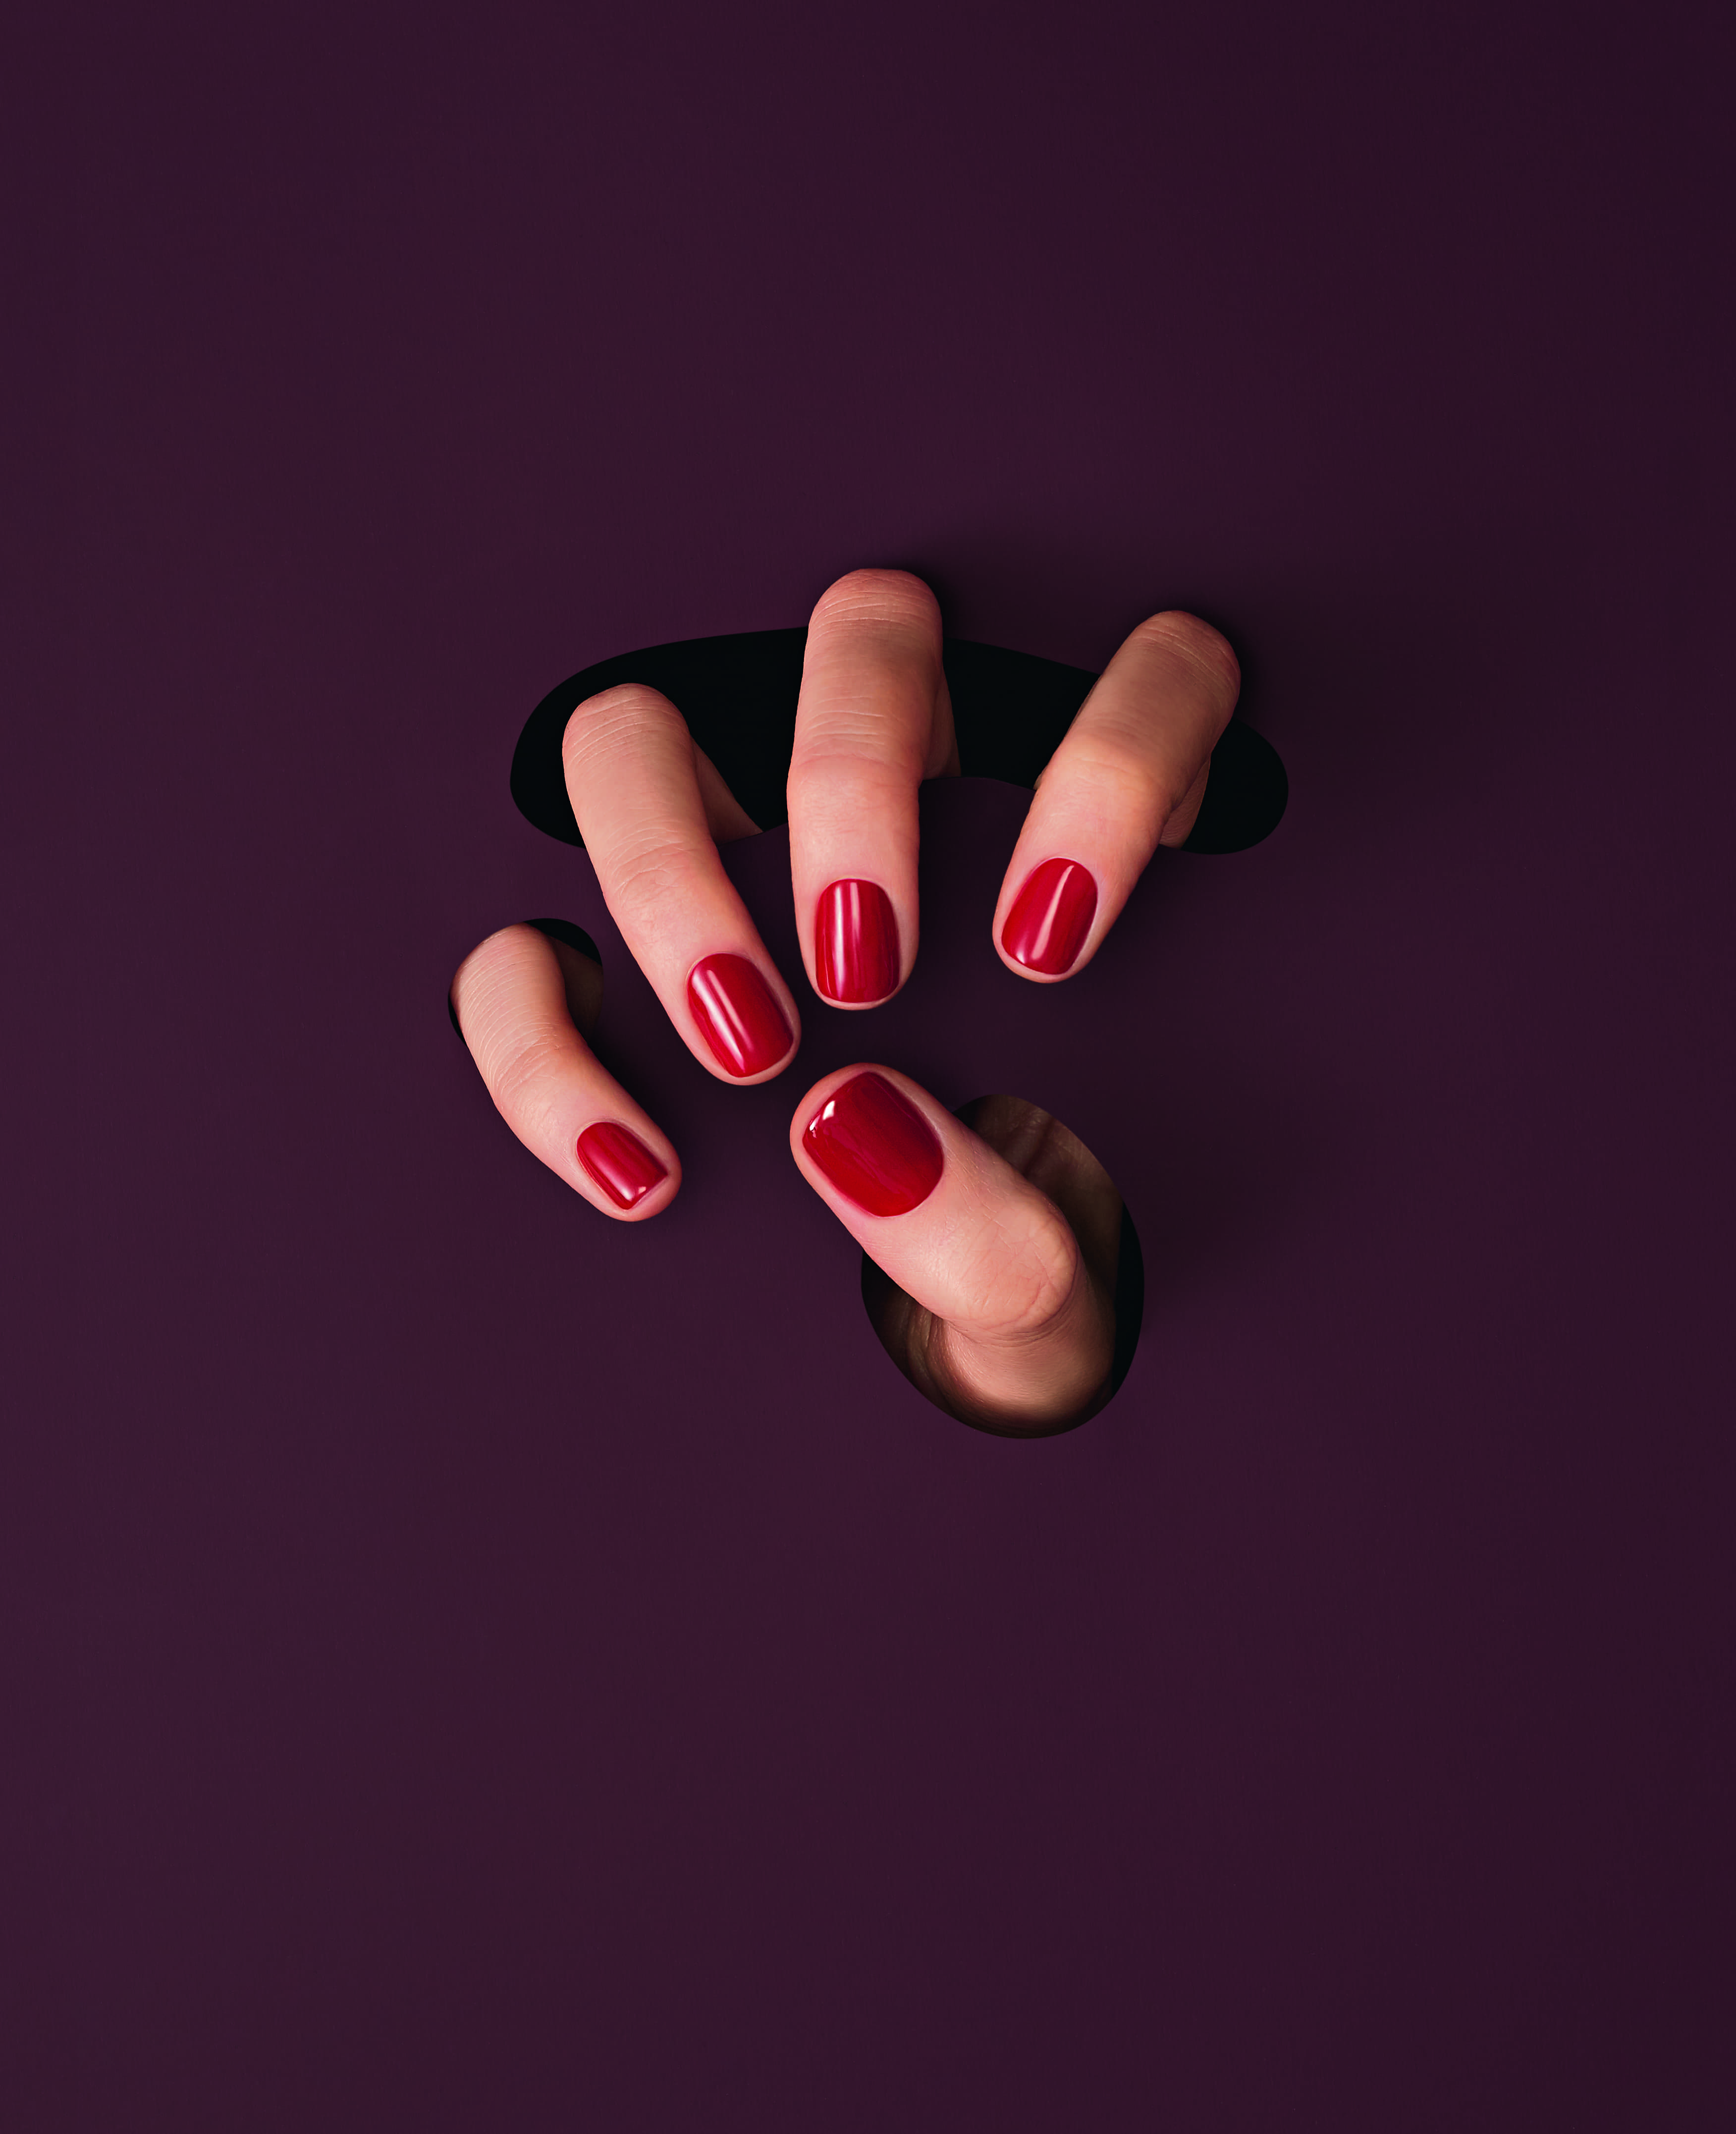 Ногти с лаком Vernis 152 Nomme Desir, Lancôme